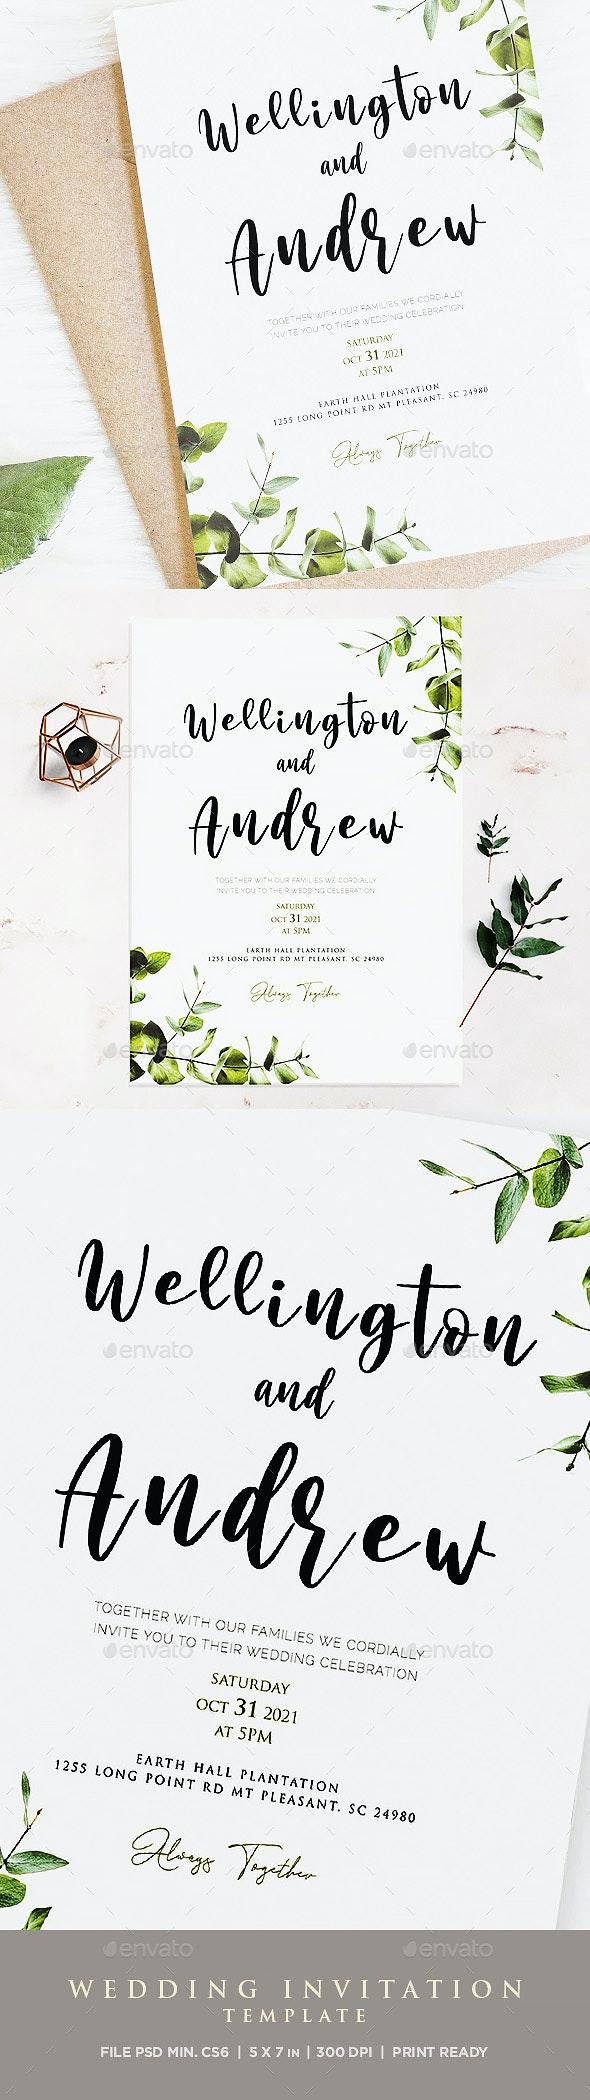 Professional Boho Wedding Invitation Template - Weddings Cards & Invites